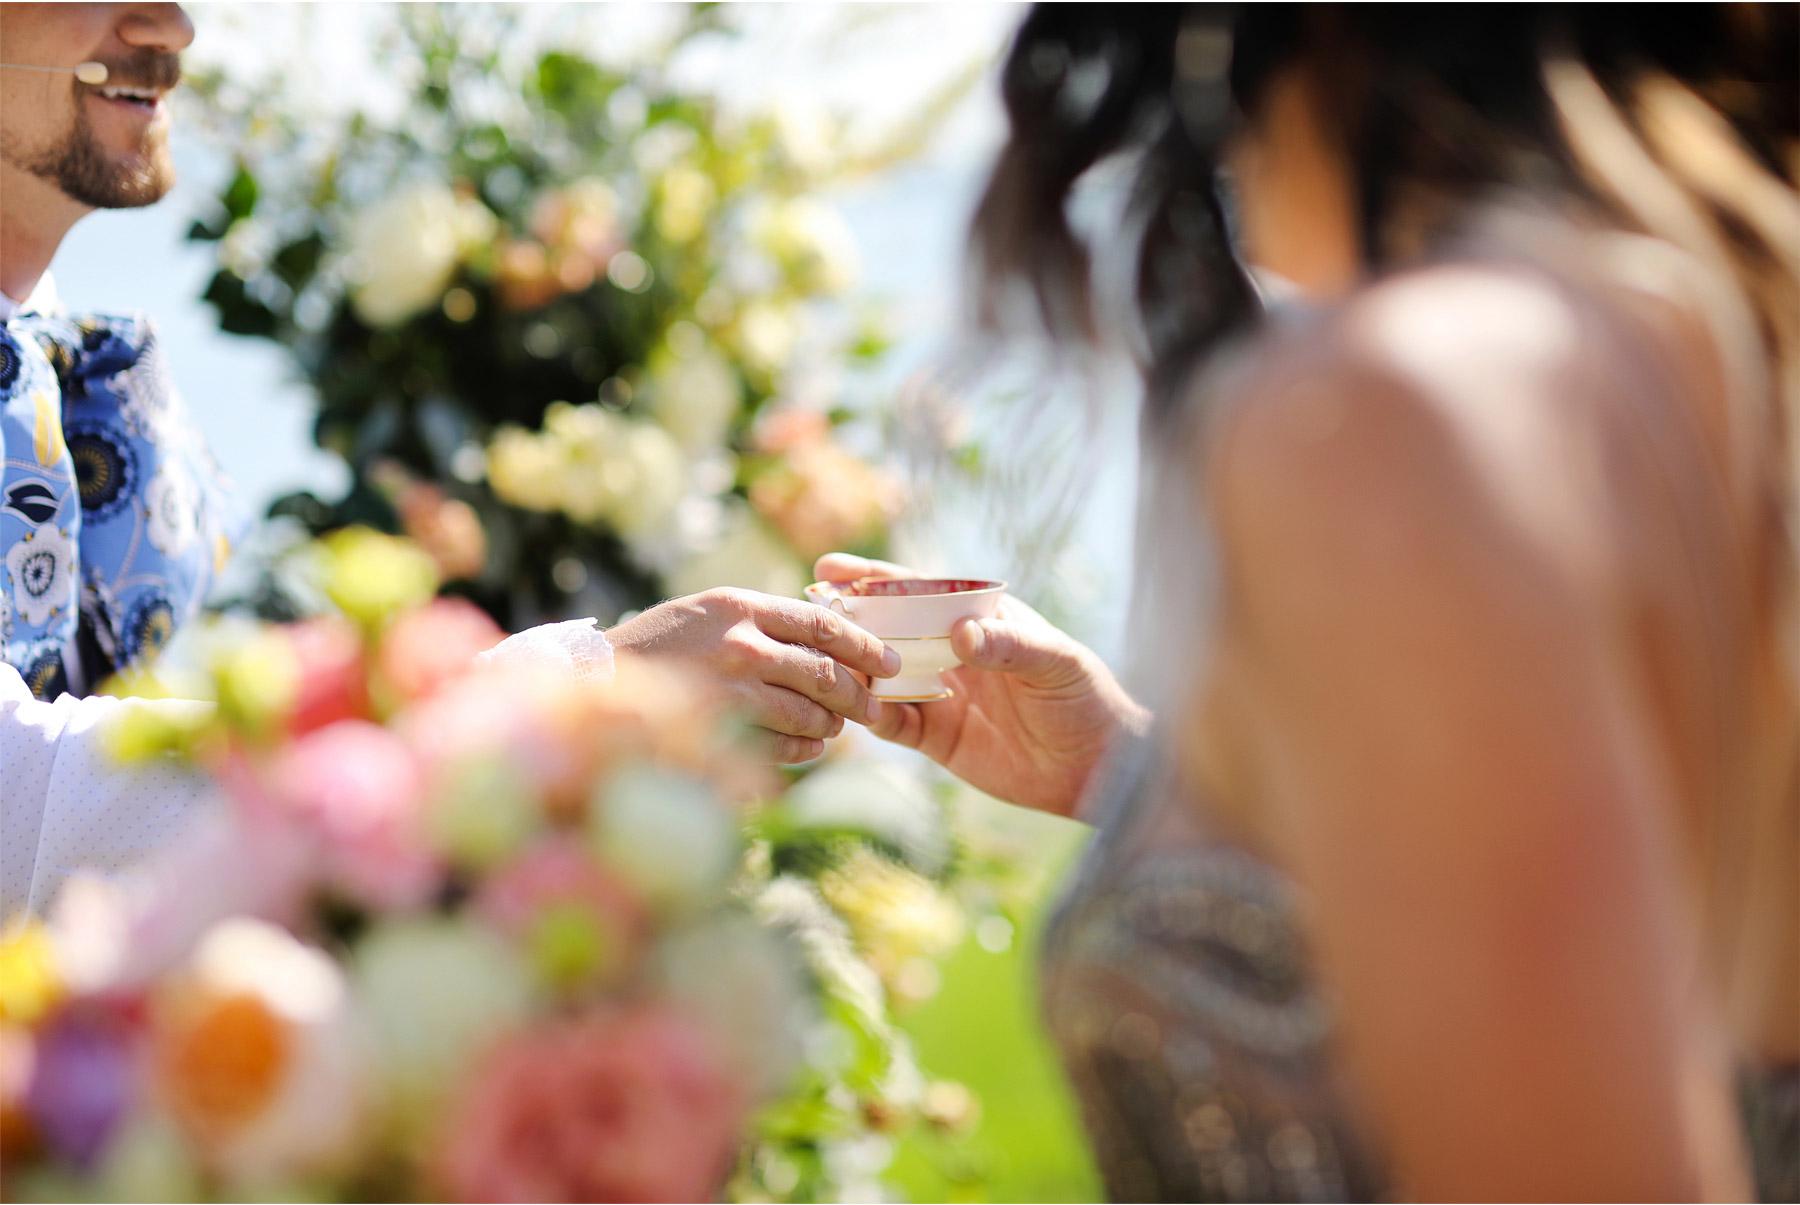 10-Vick-Photography-Wedding-Ottertail-Minnesota-Alice-in-Wonderland-Theme-Ceremony-Tea-Teacup-Tess-and-Greg.jpg